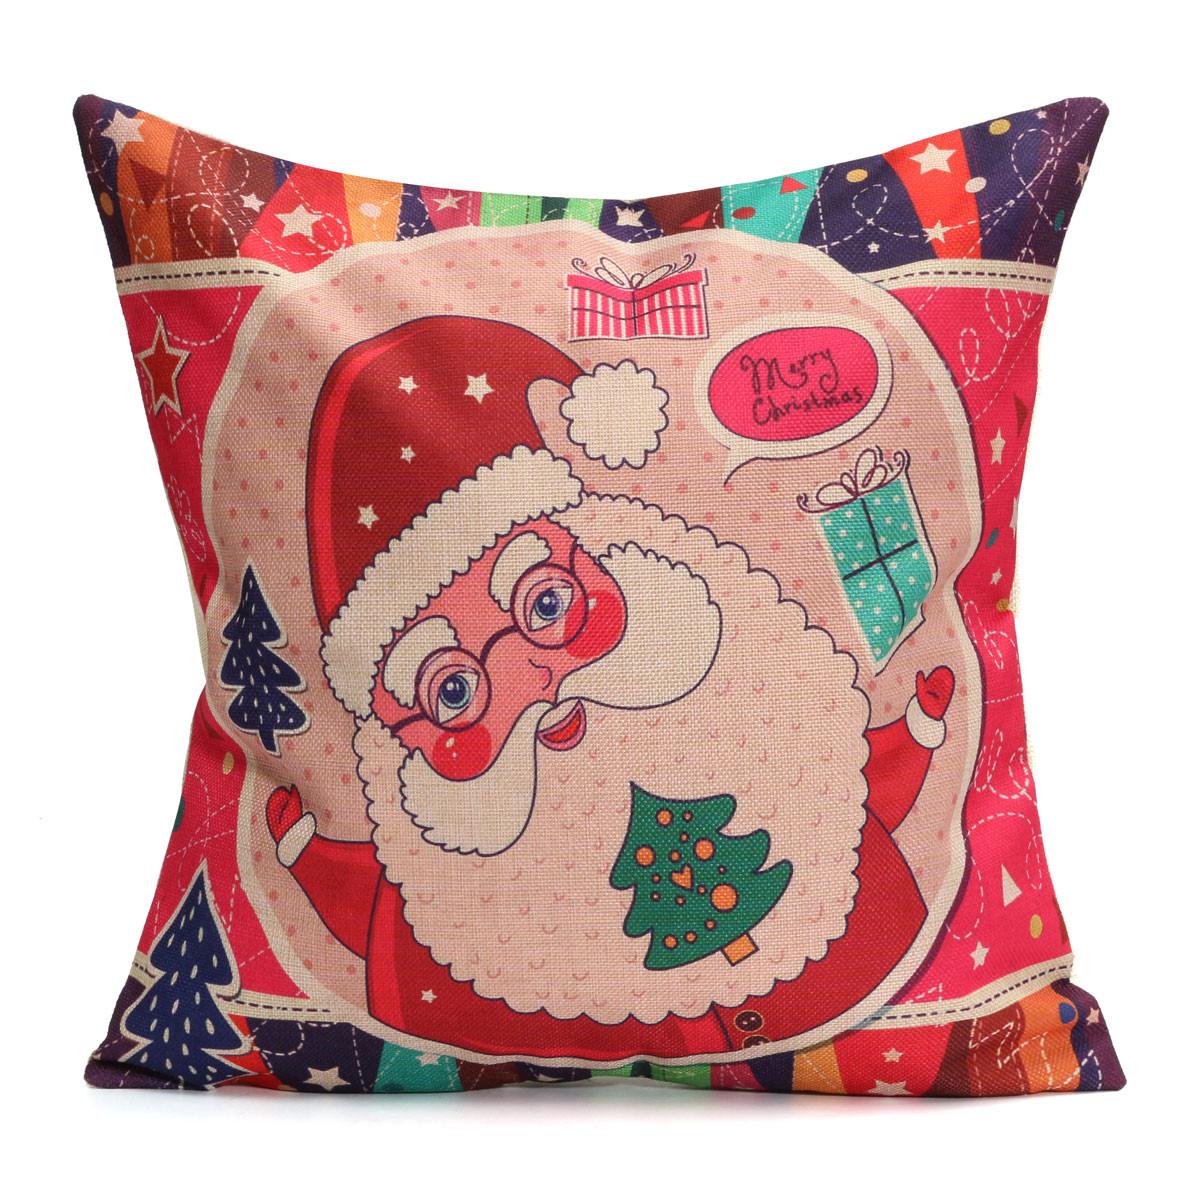 santa chair covers australia outdoor plastic chairs kmart christmas cotton linen pillow case cushion cover